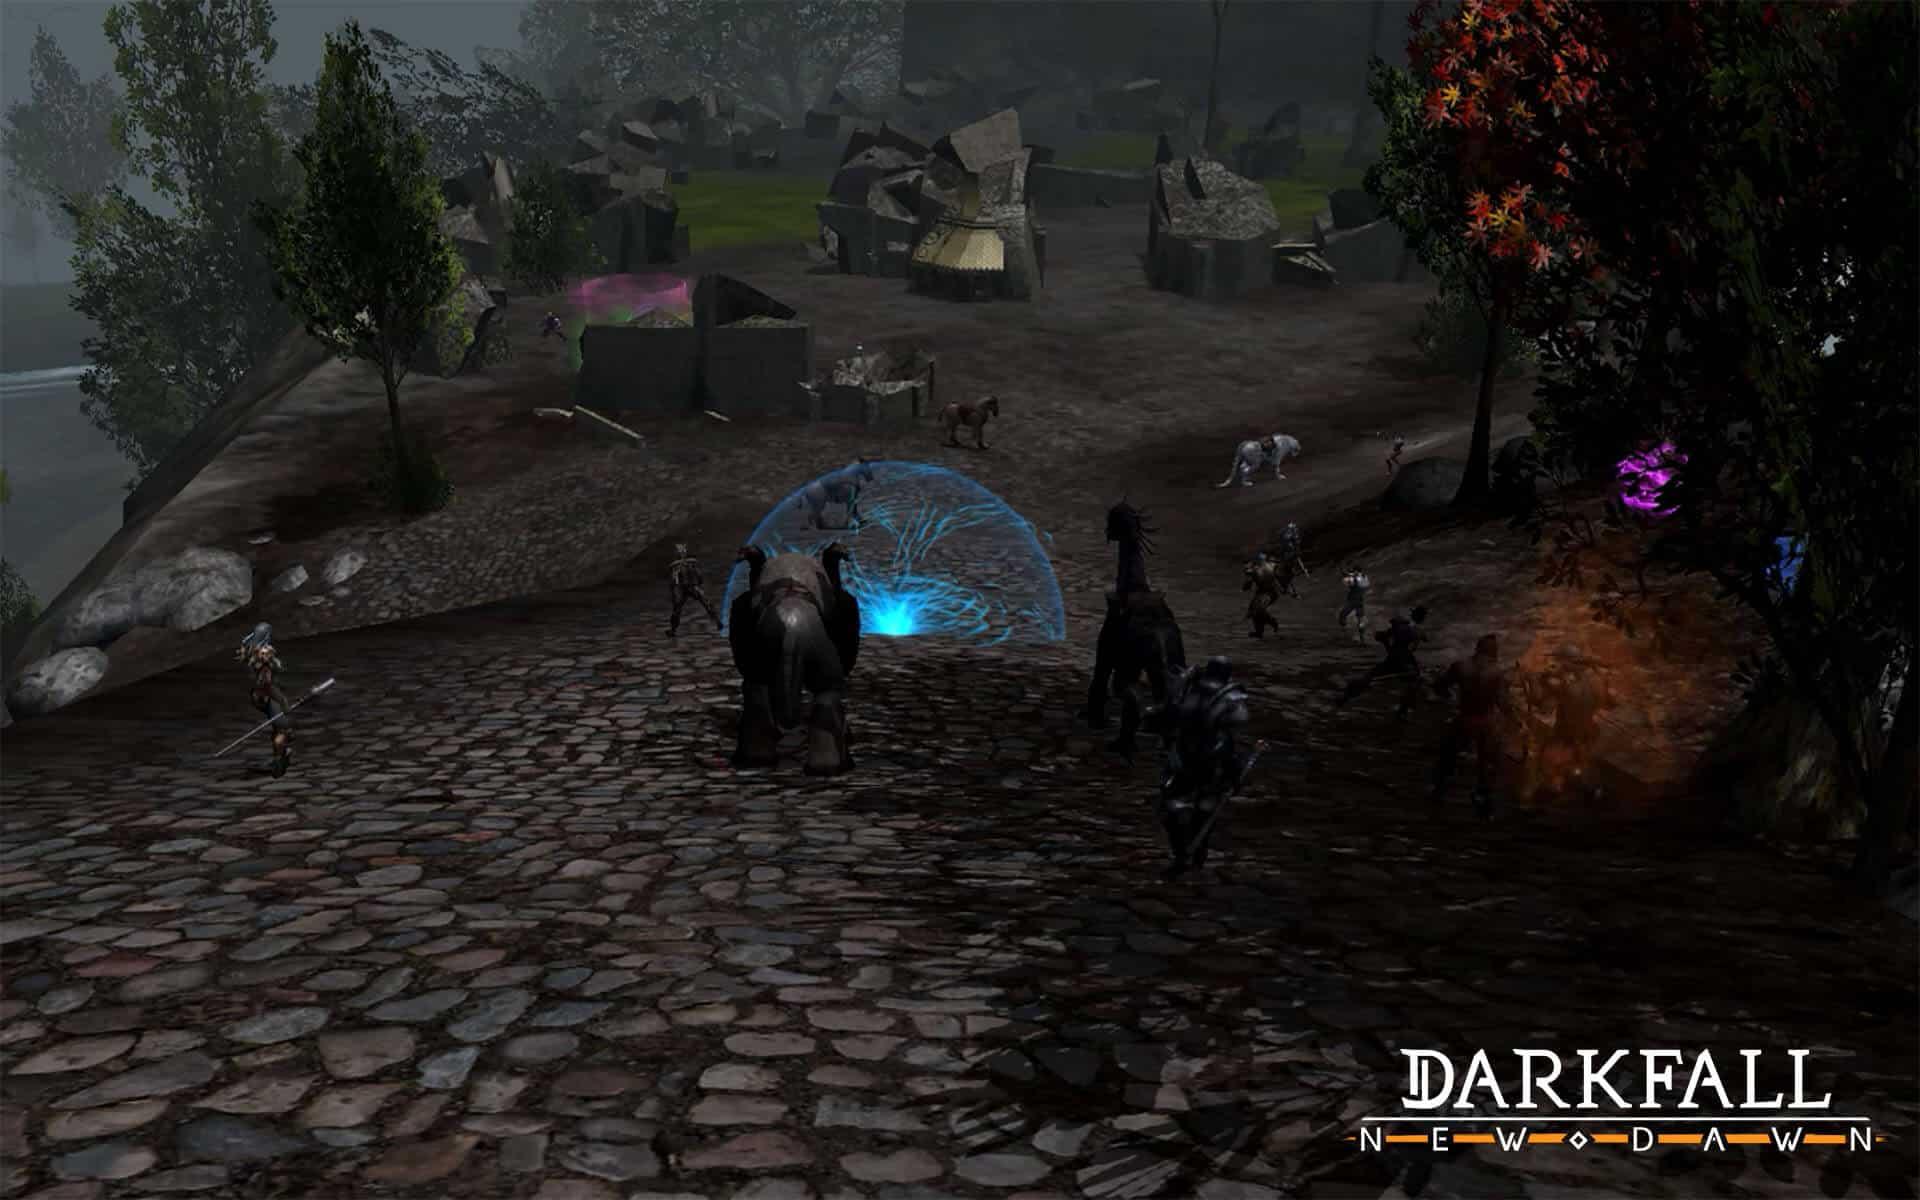 DarkFall New Dawn - dlc 2.1